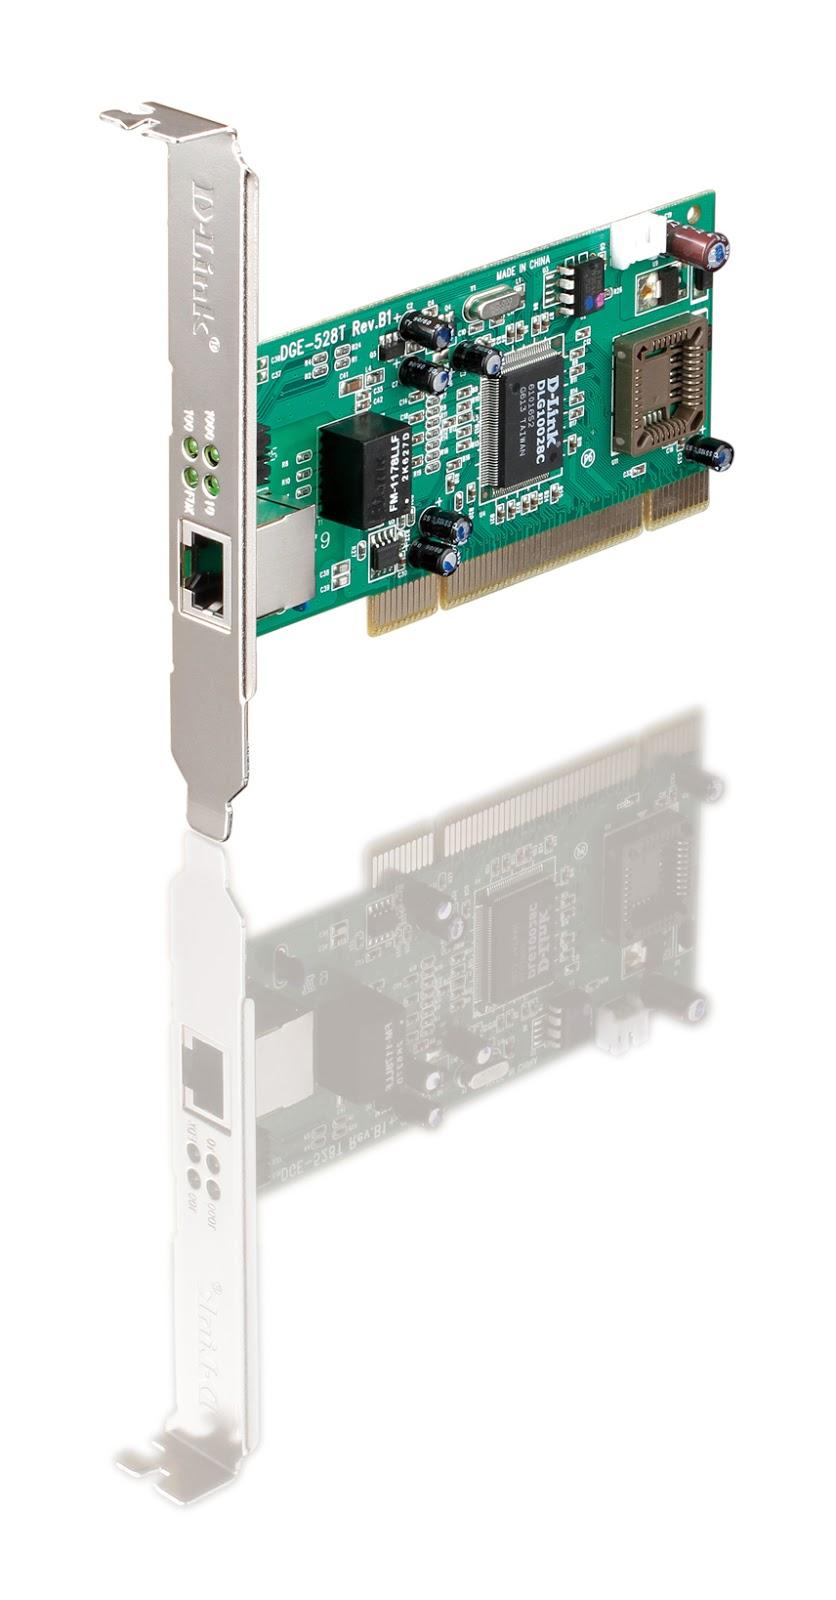 The Creator Systems August 2013 Cell Phone Detector Circuit Mini Bug Detectors Of Portablejammer Dlink Dge 528t 32 Bit Gigabit Pci Ethernet Lan Card Network Adapter